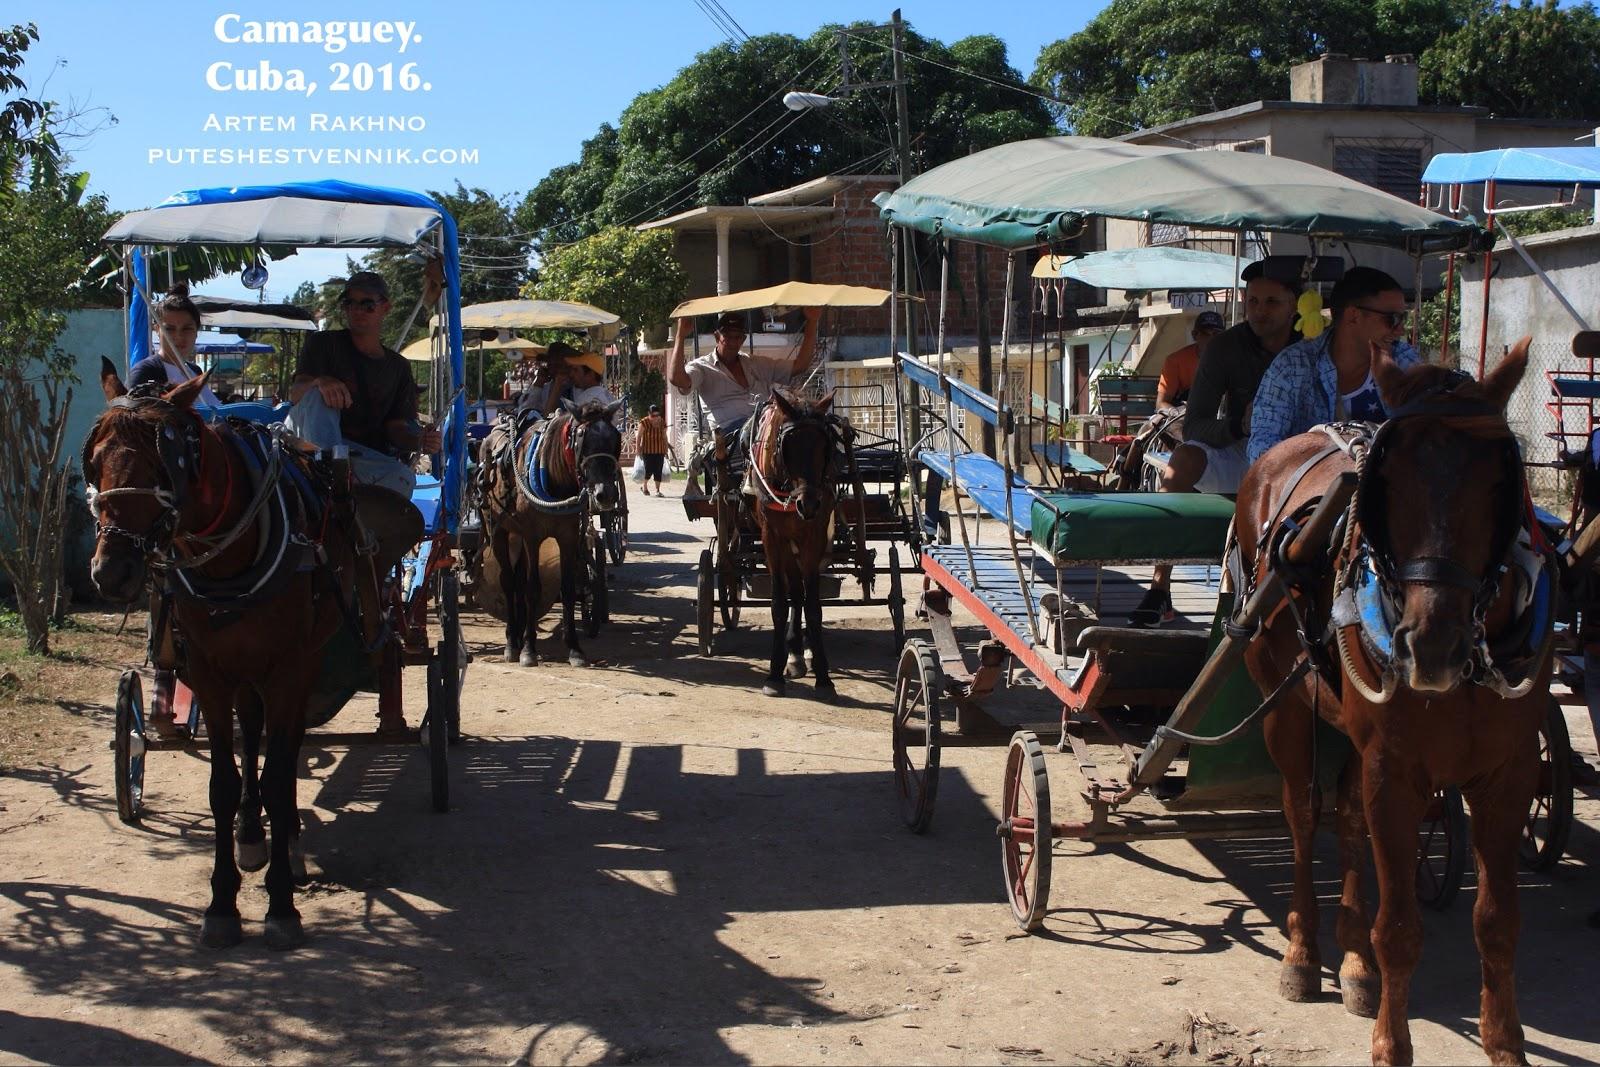 Стоянка извозчиков на улице кубинского города